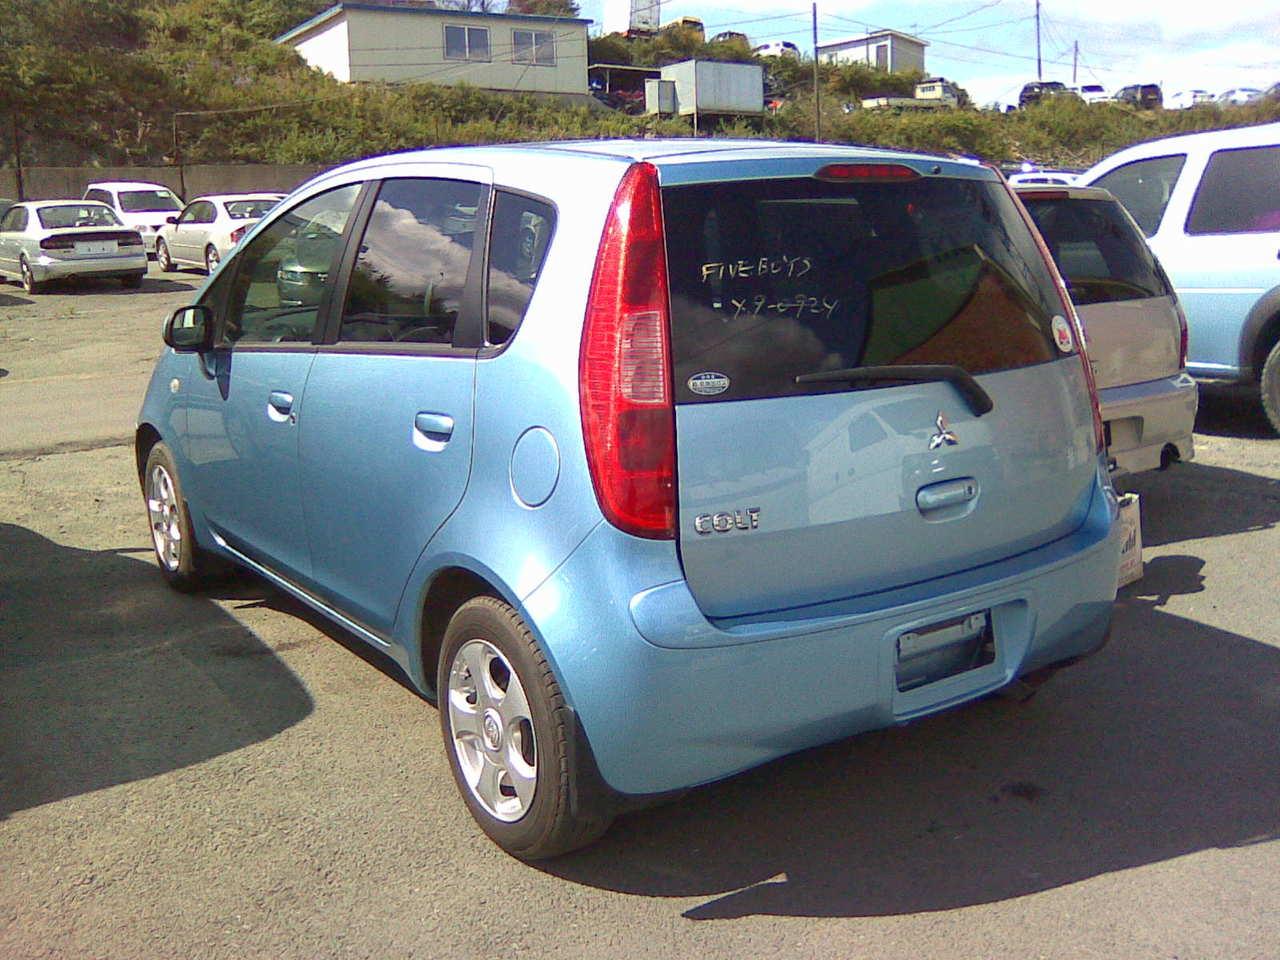 2003 Mitsubishi Colt Pictures 1 3l Gasoline Ff